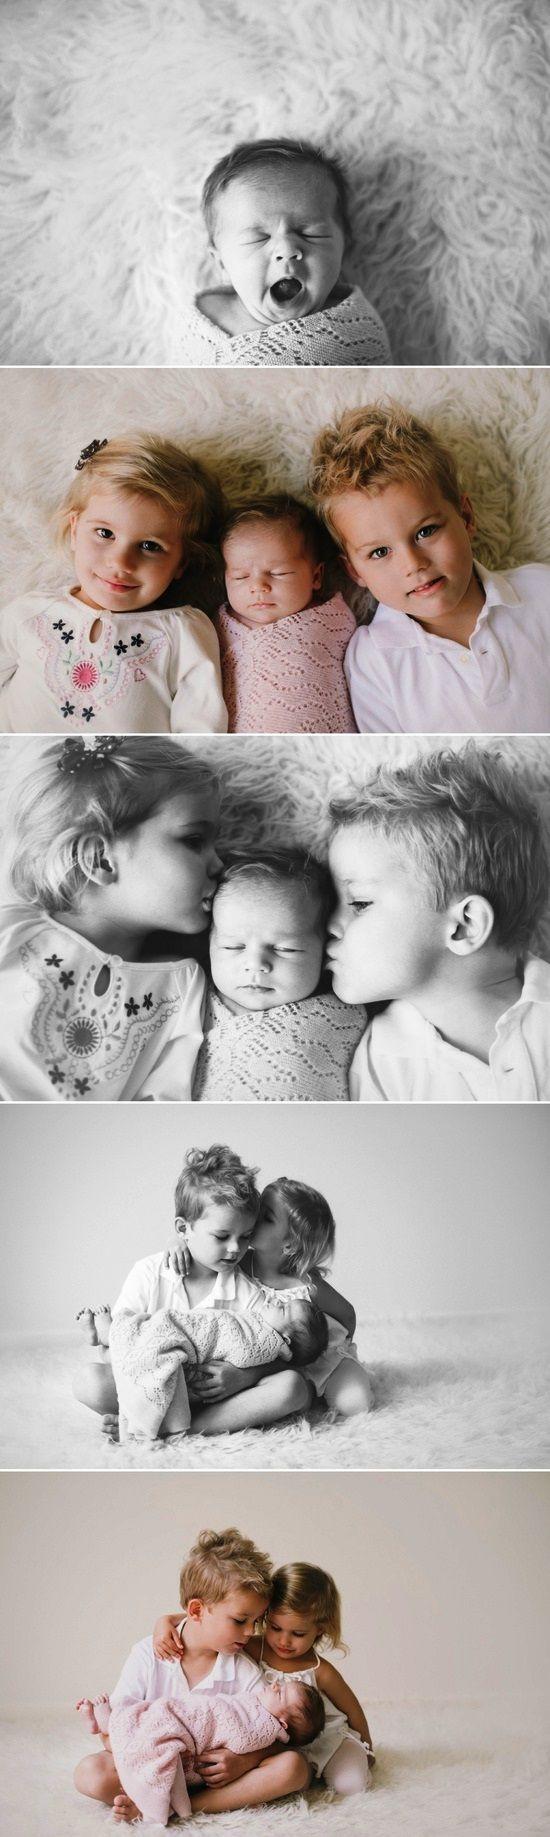 Newborn infant with siblings Toni Kami ~•❤• Bébé •❤•~ Precious family newborn baby photography idea